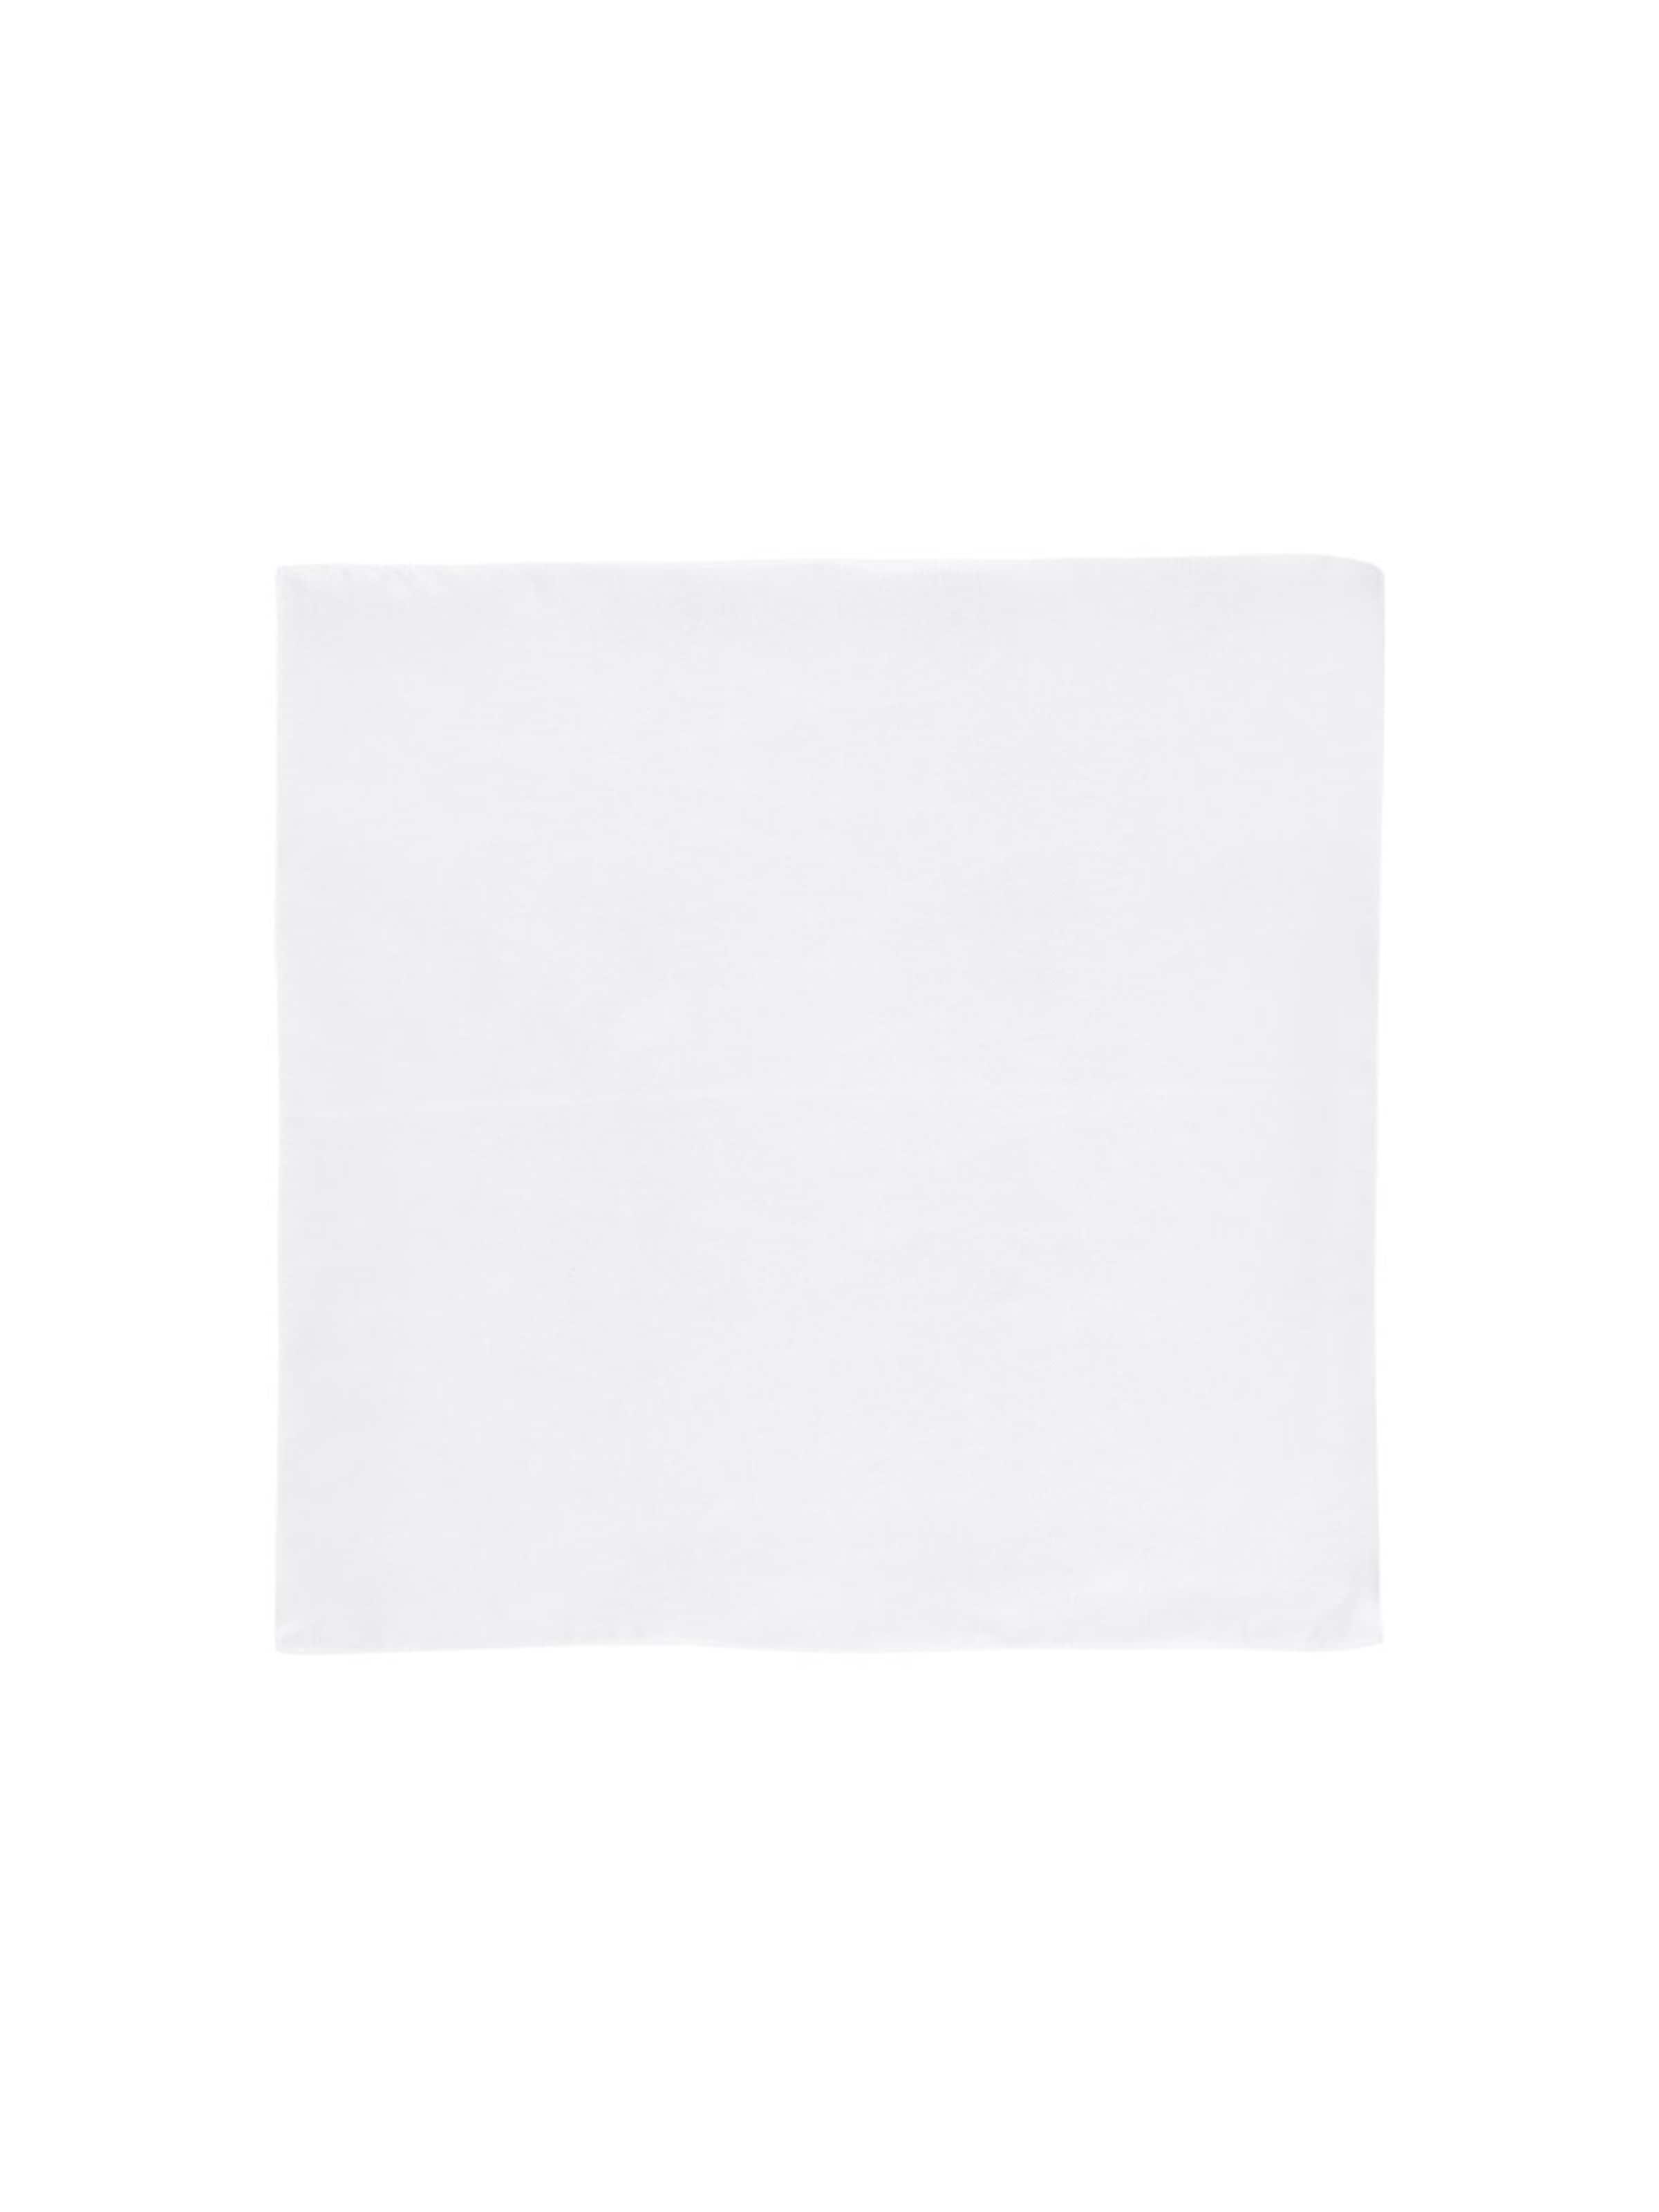 lindeberg Foulard Square' '28 J Blanc En PkiuXZO